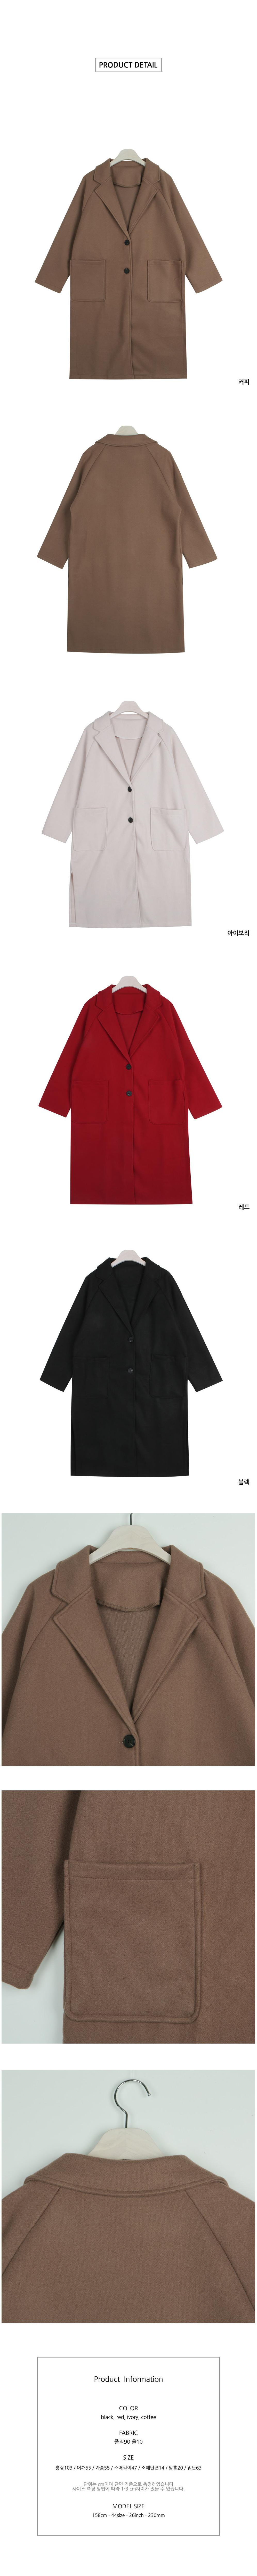 Basic Big Pocket Two Button Long Coat O#YW122